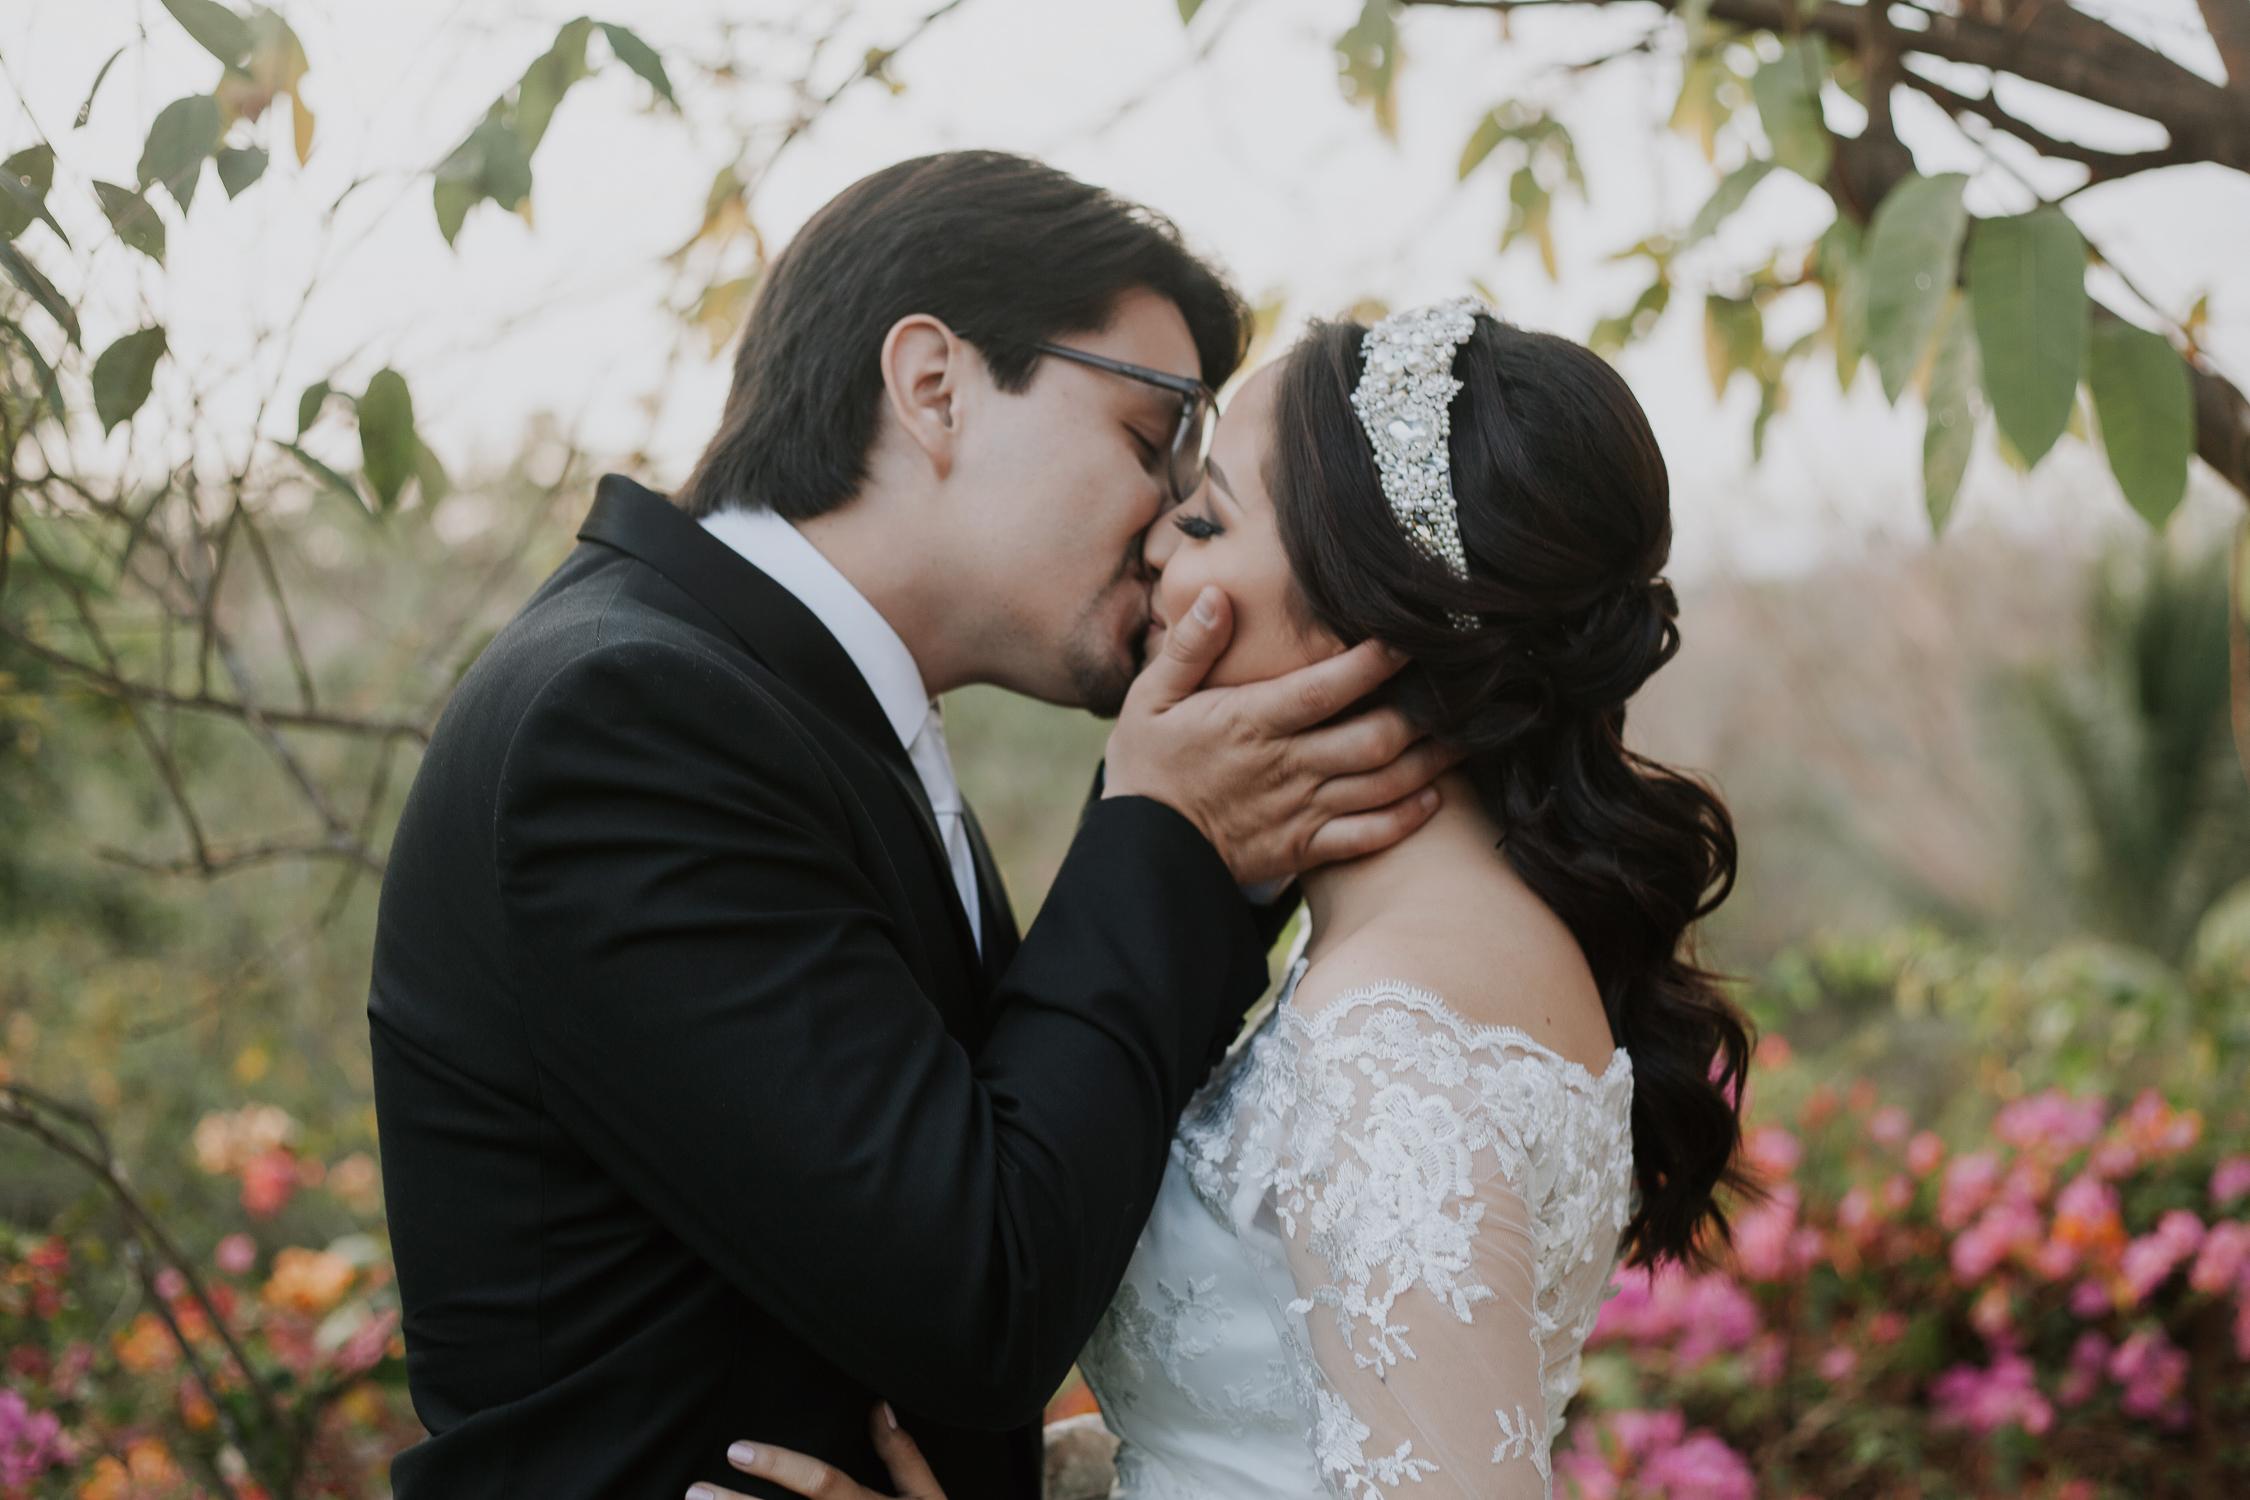 Michelle-Agurto-Fotografia-Bodas-Ecuador-Destination-Wedding-Photographer-Pauli-Edwin-13.JPG